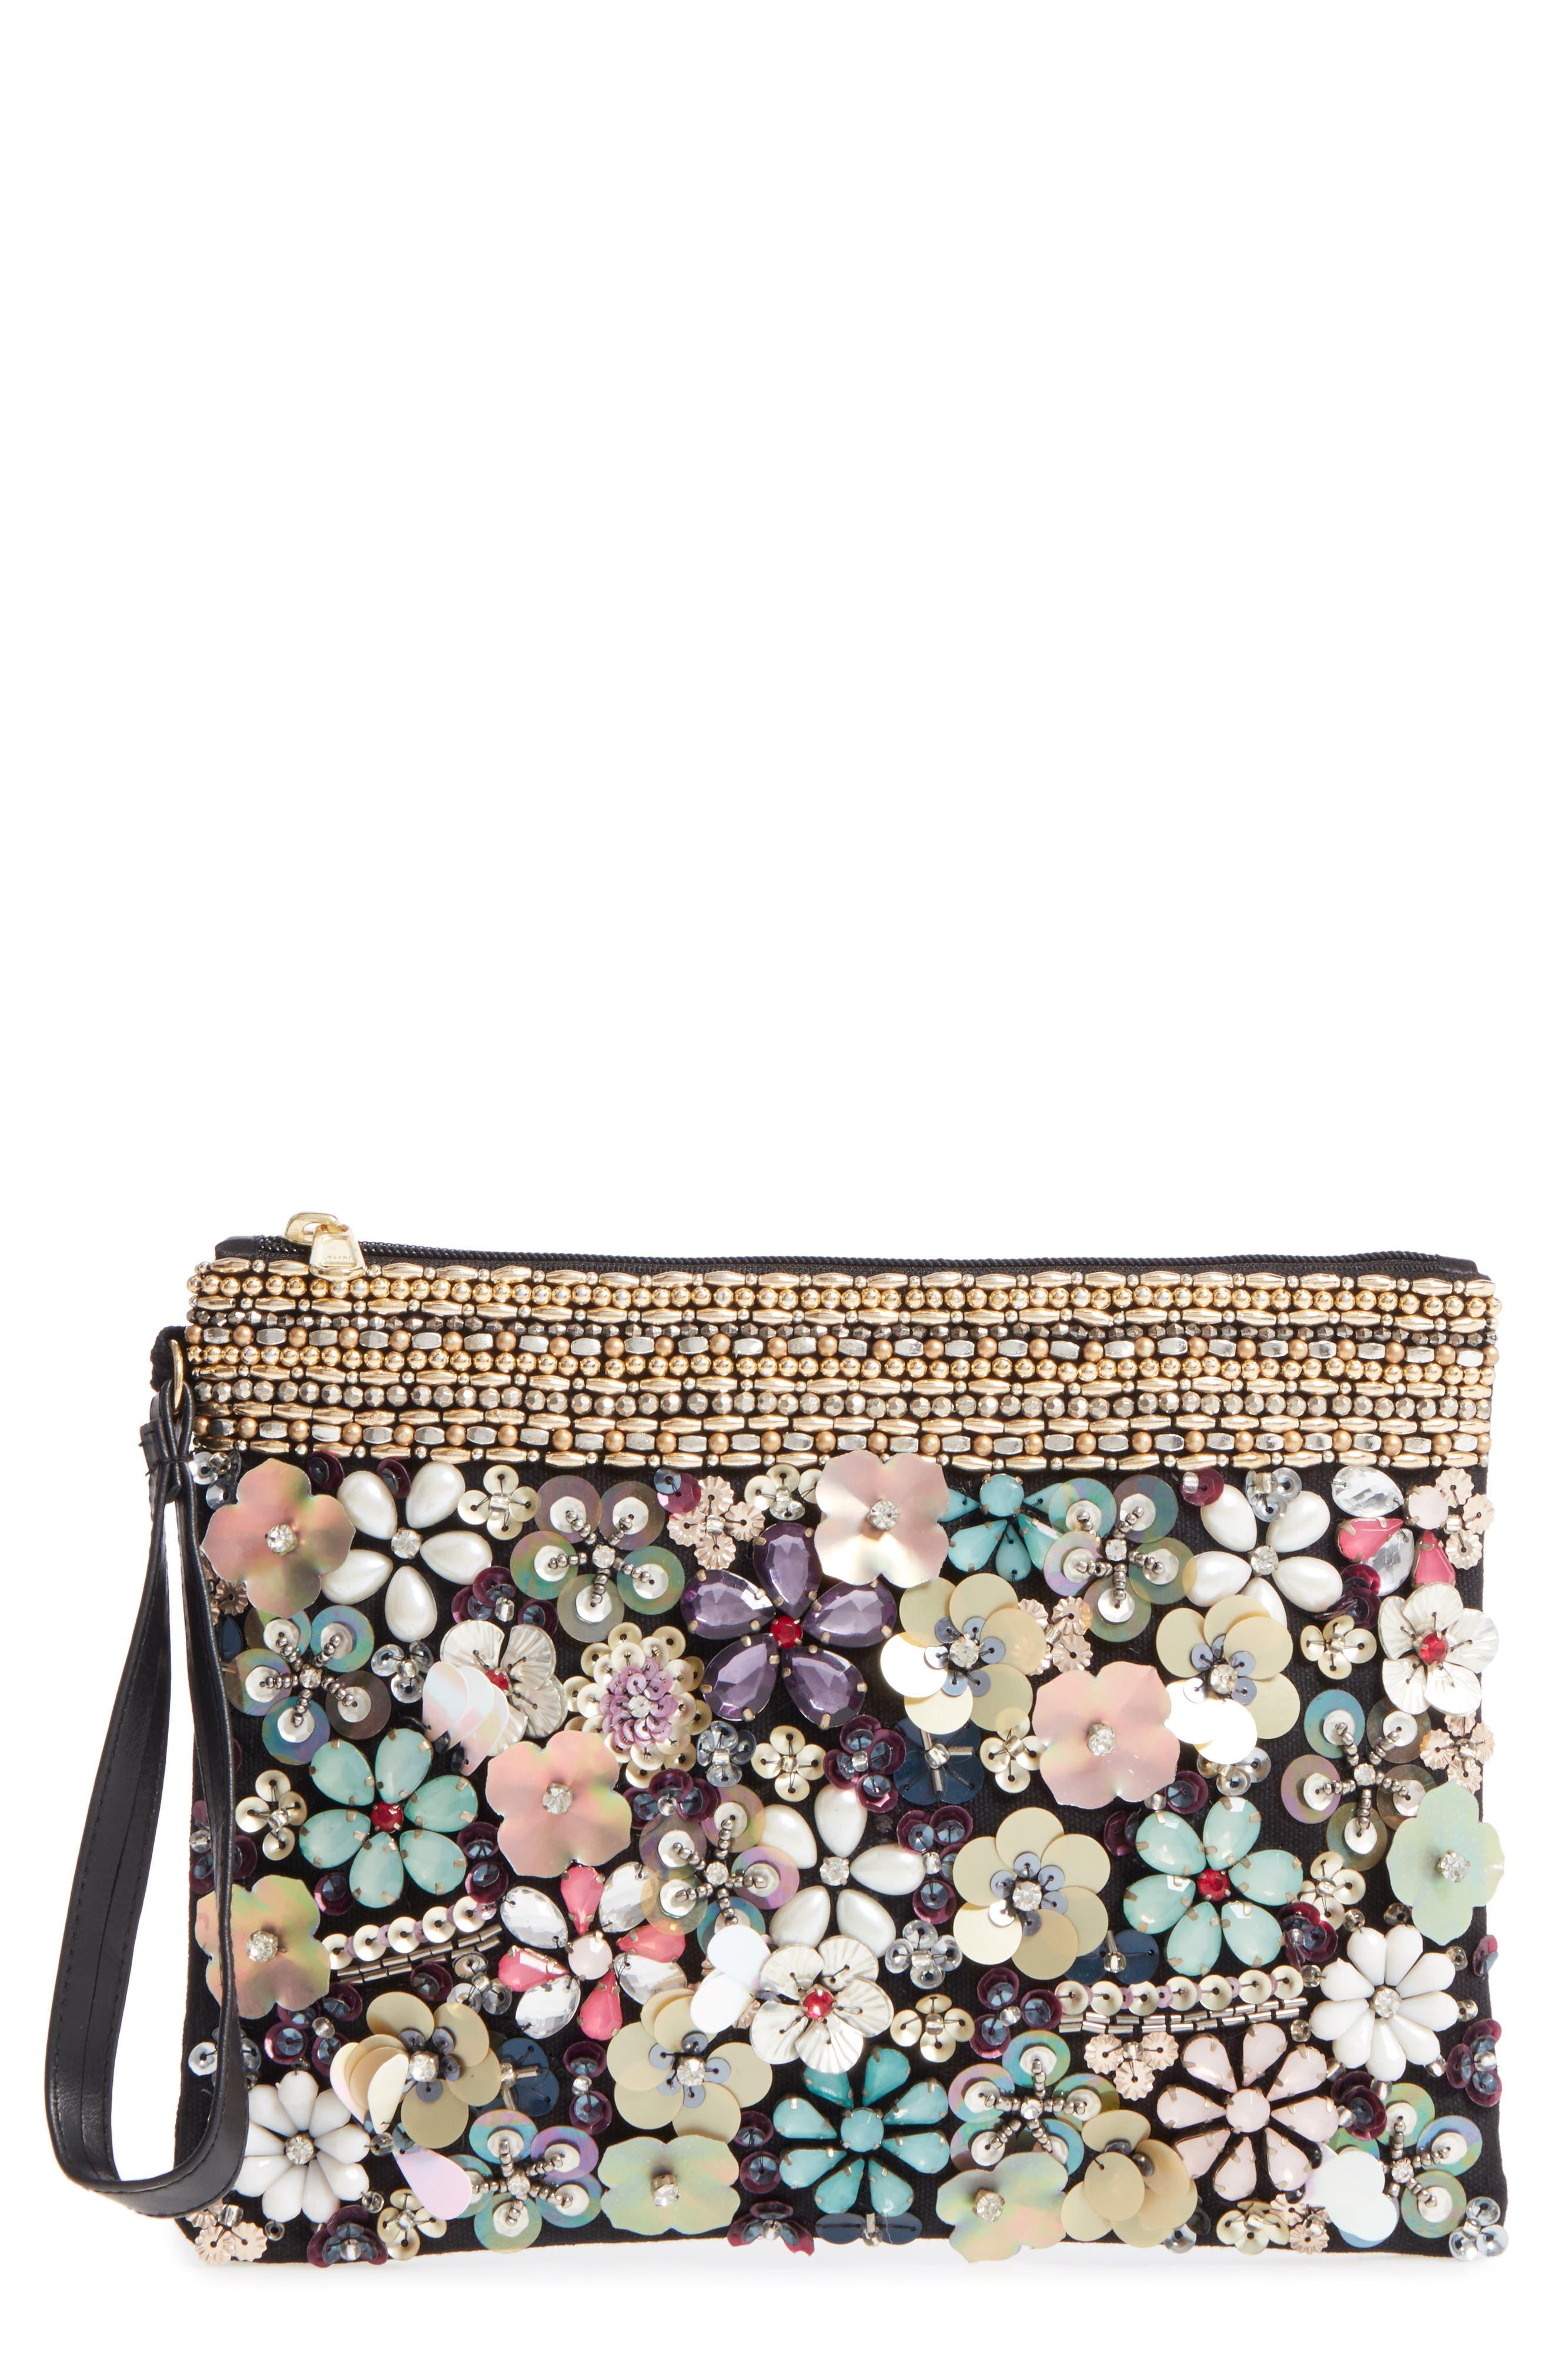 Natasha Couture Embellished Garden Clutch